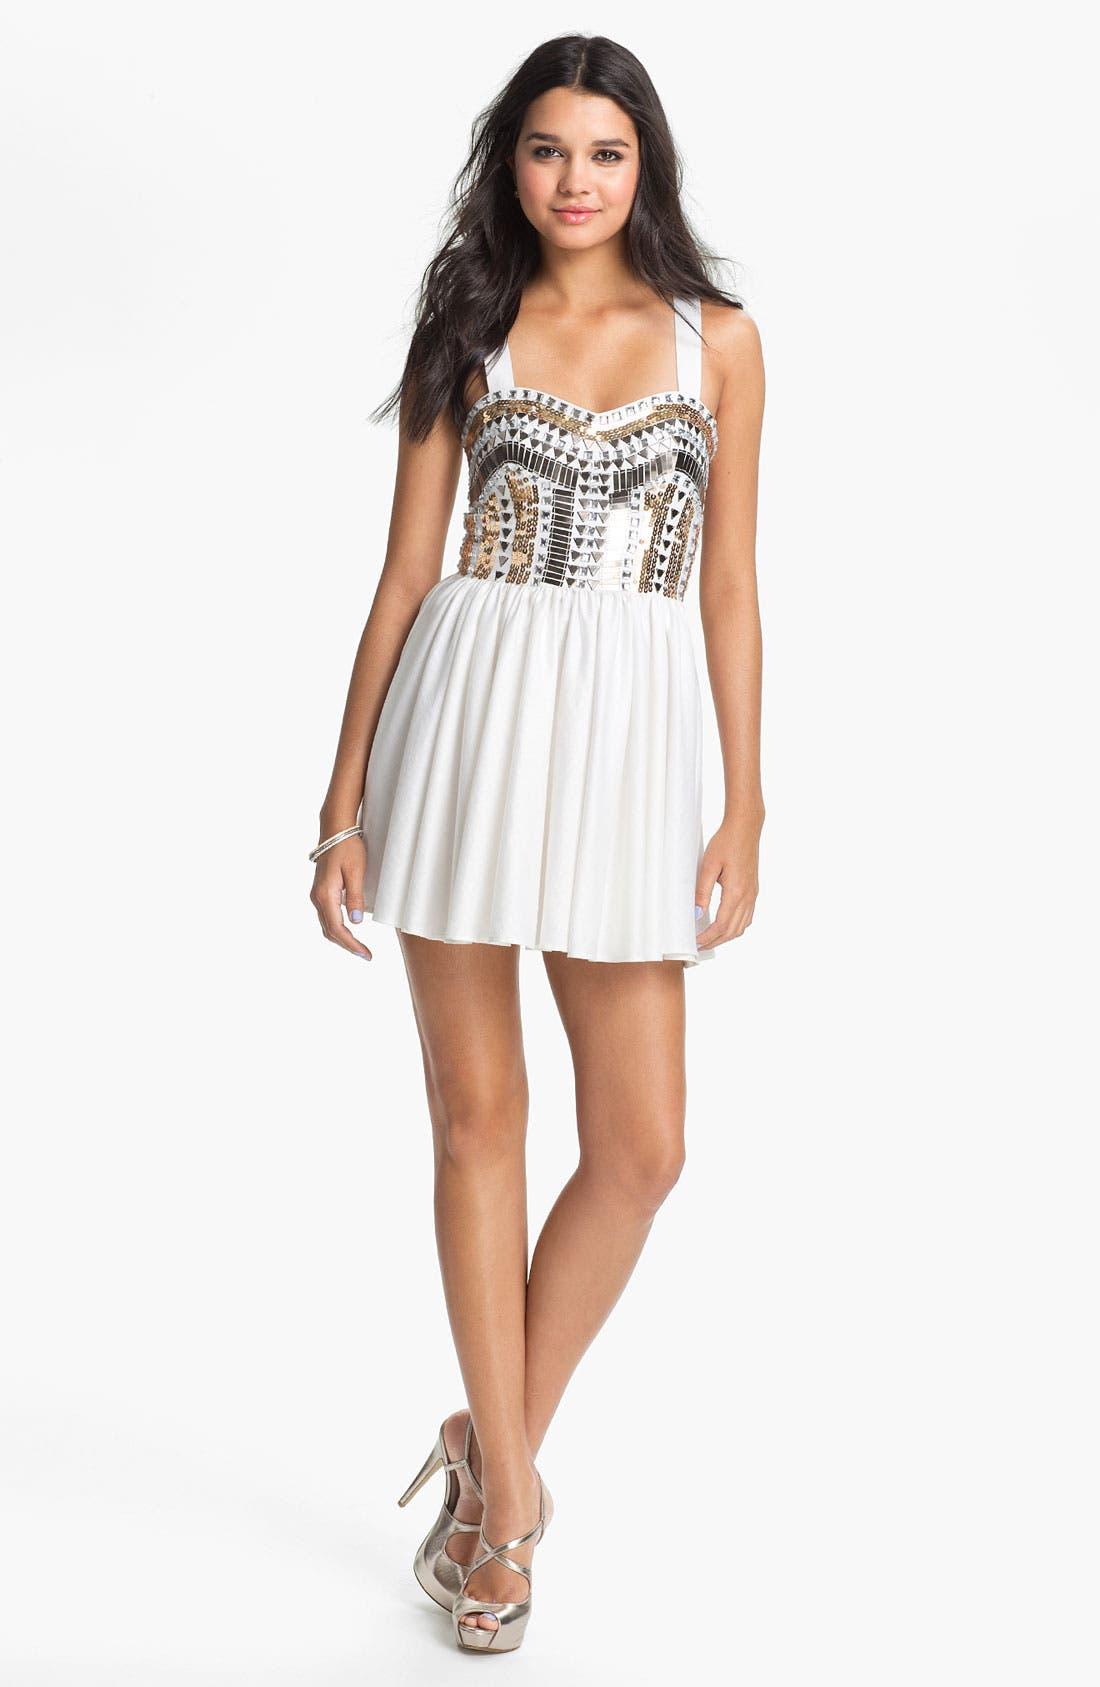 Main Image - Keepsake the Label 'Force of Nature' Embellished Dress